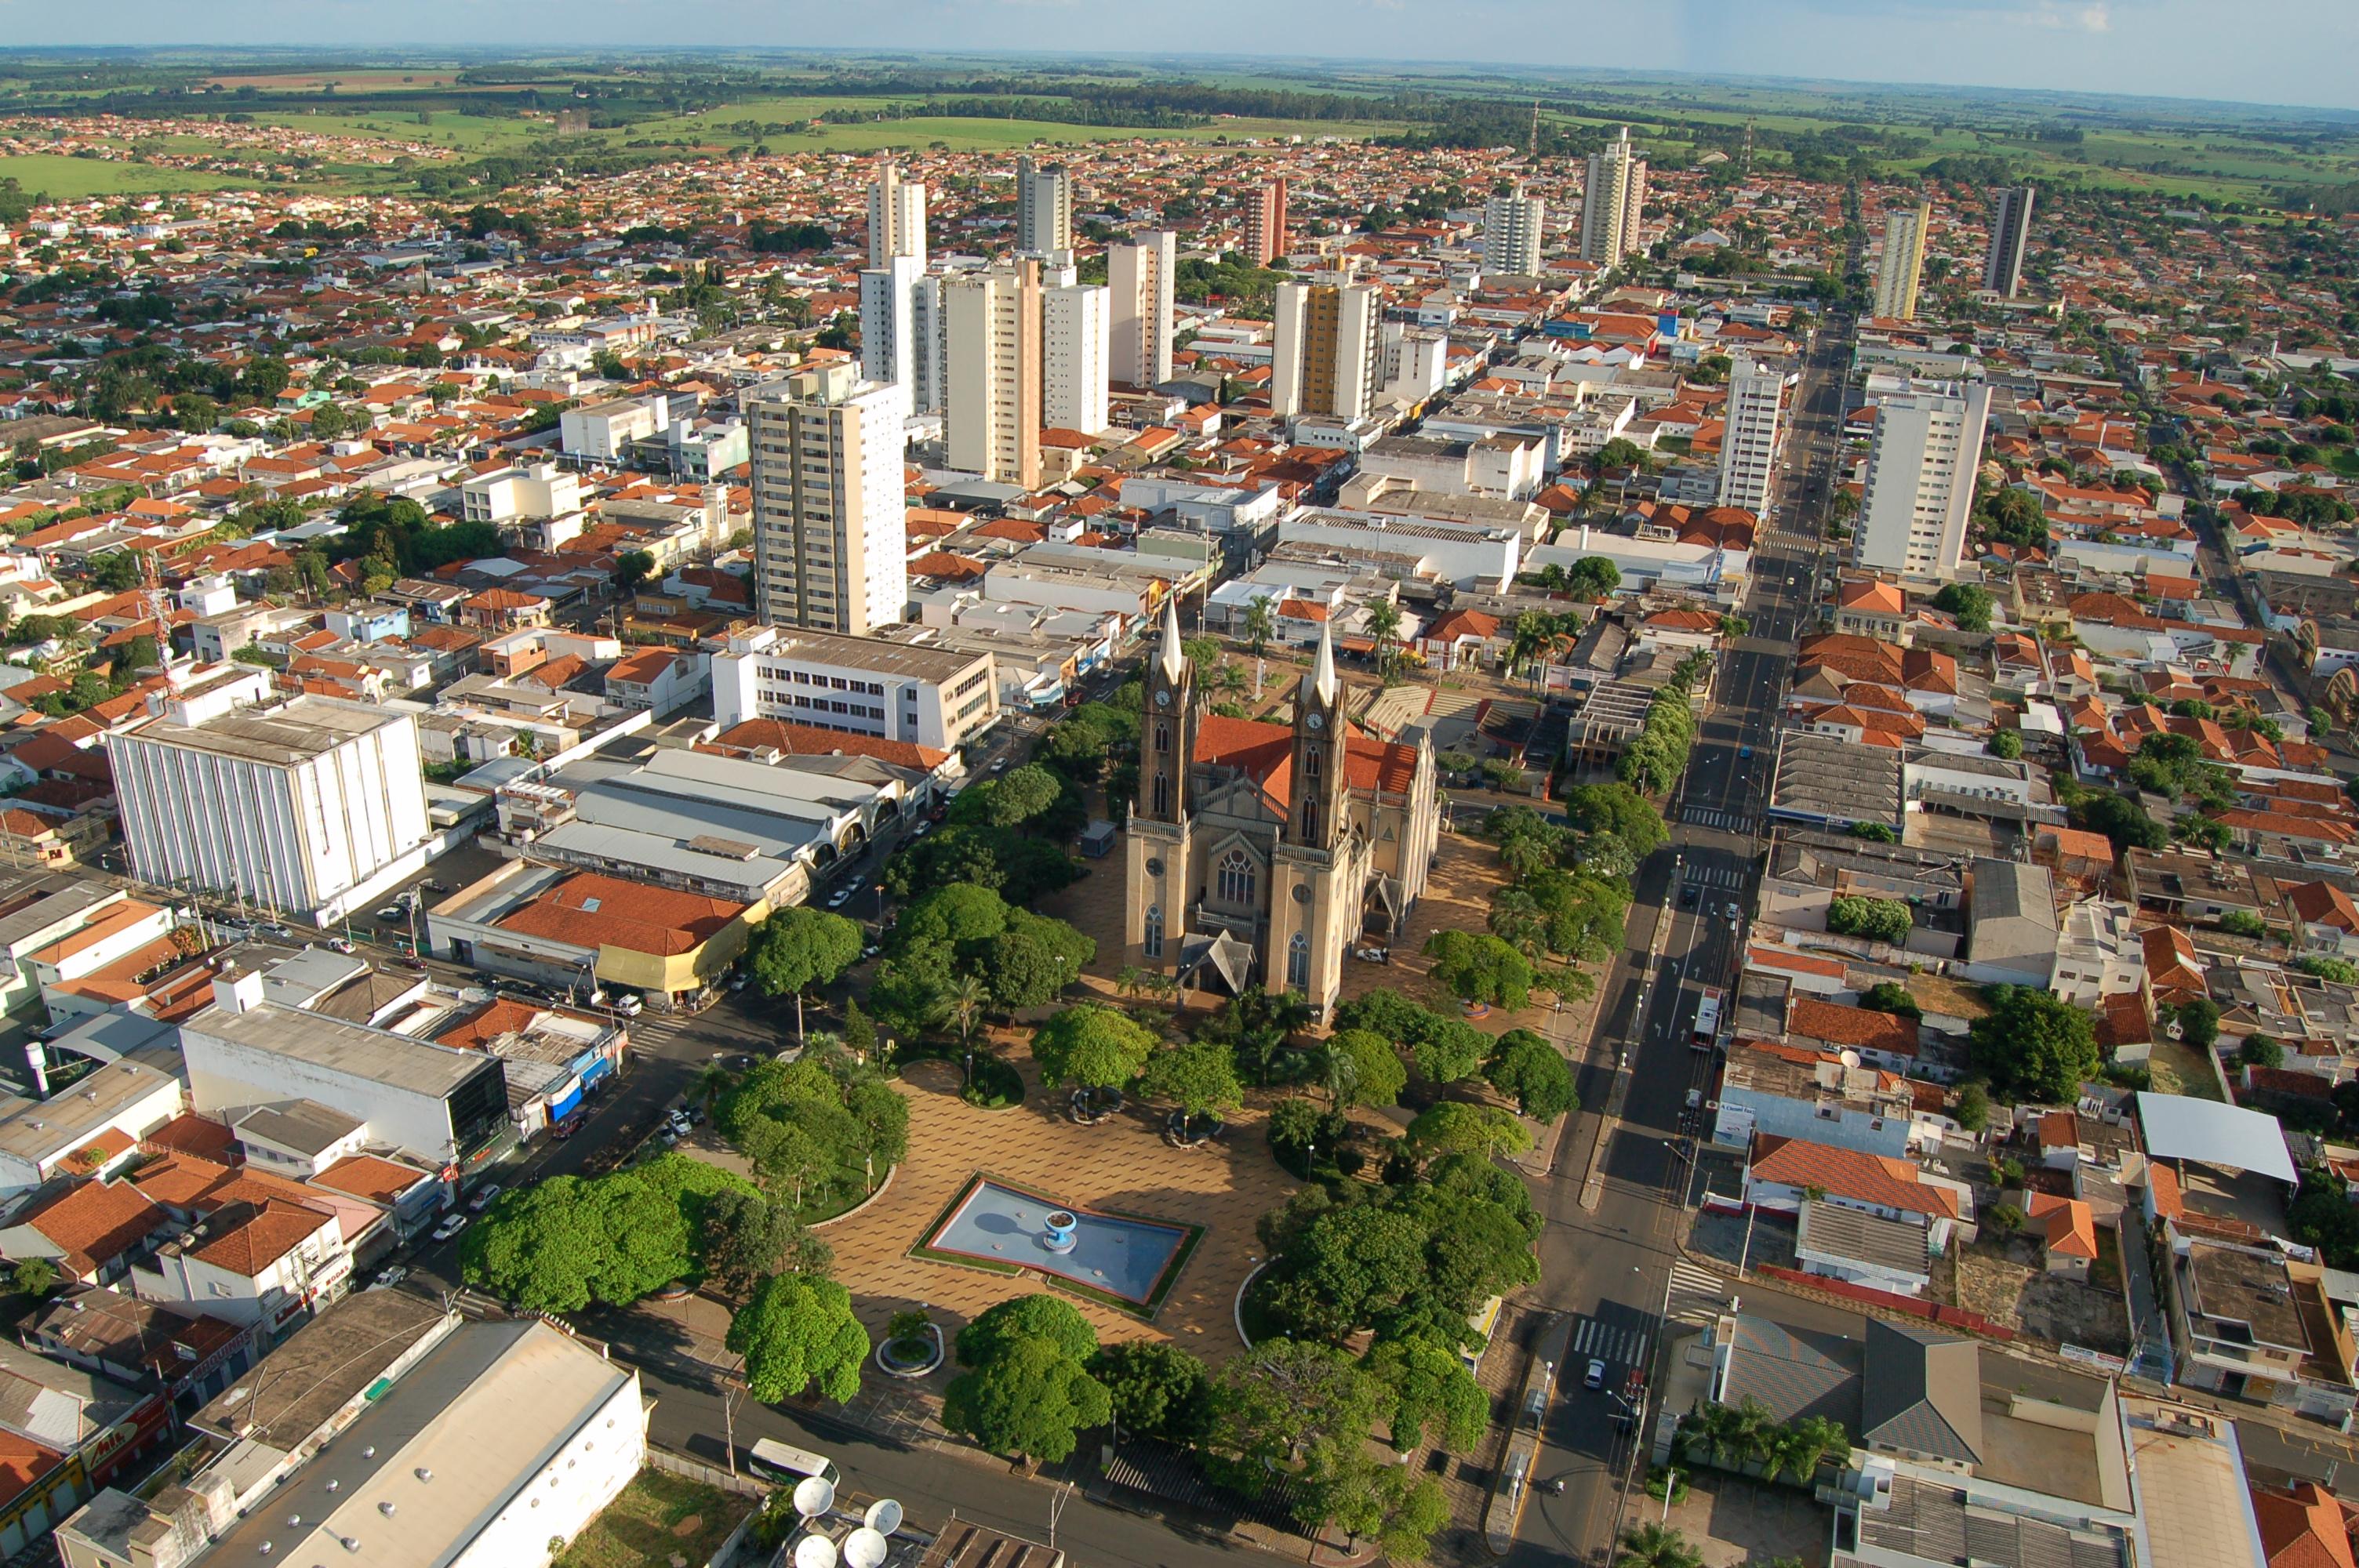 Votuporanga São Paulo fonte: upload.wikimedia.org